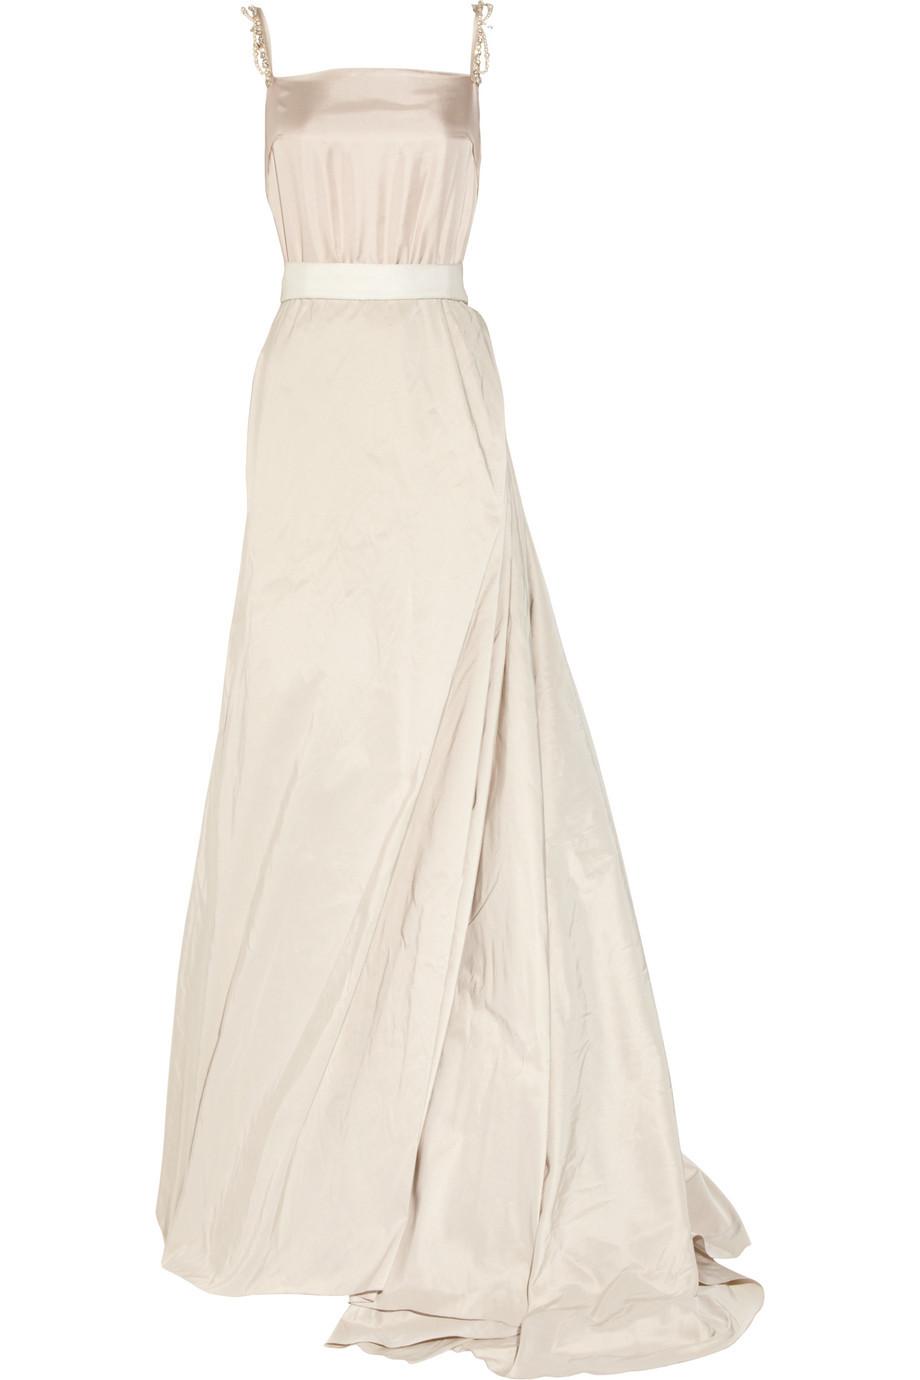 Creamy-lanvin-wedding-dress-square-neck-silk-taffeta.full